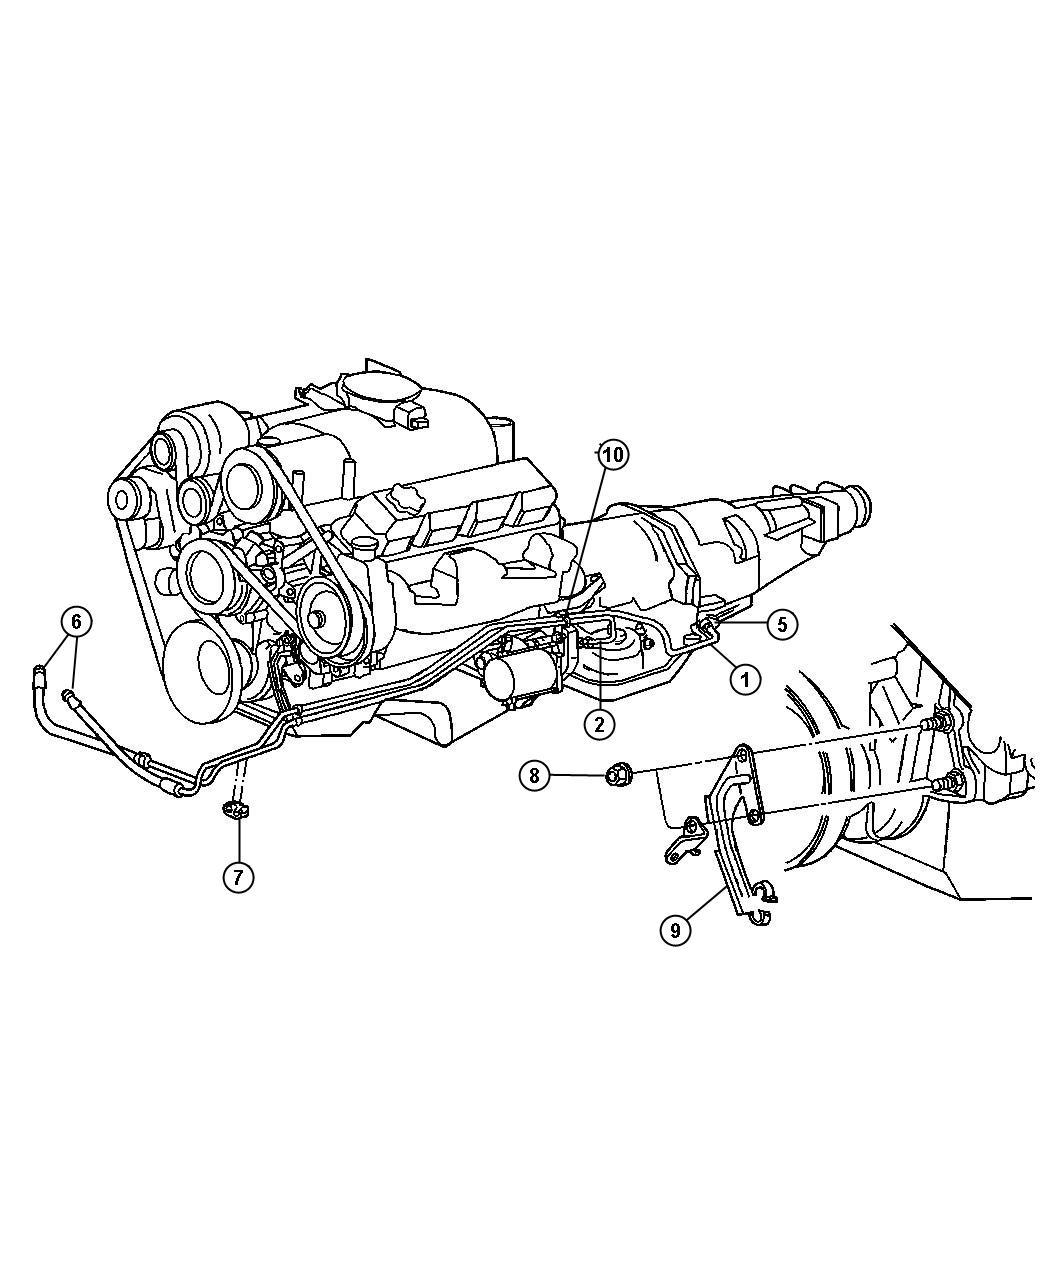 Dodge Dakota Used For Hose And Valve Transmission